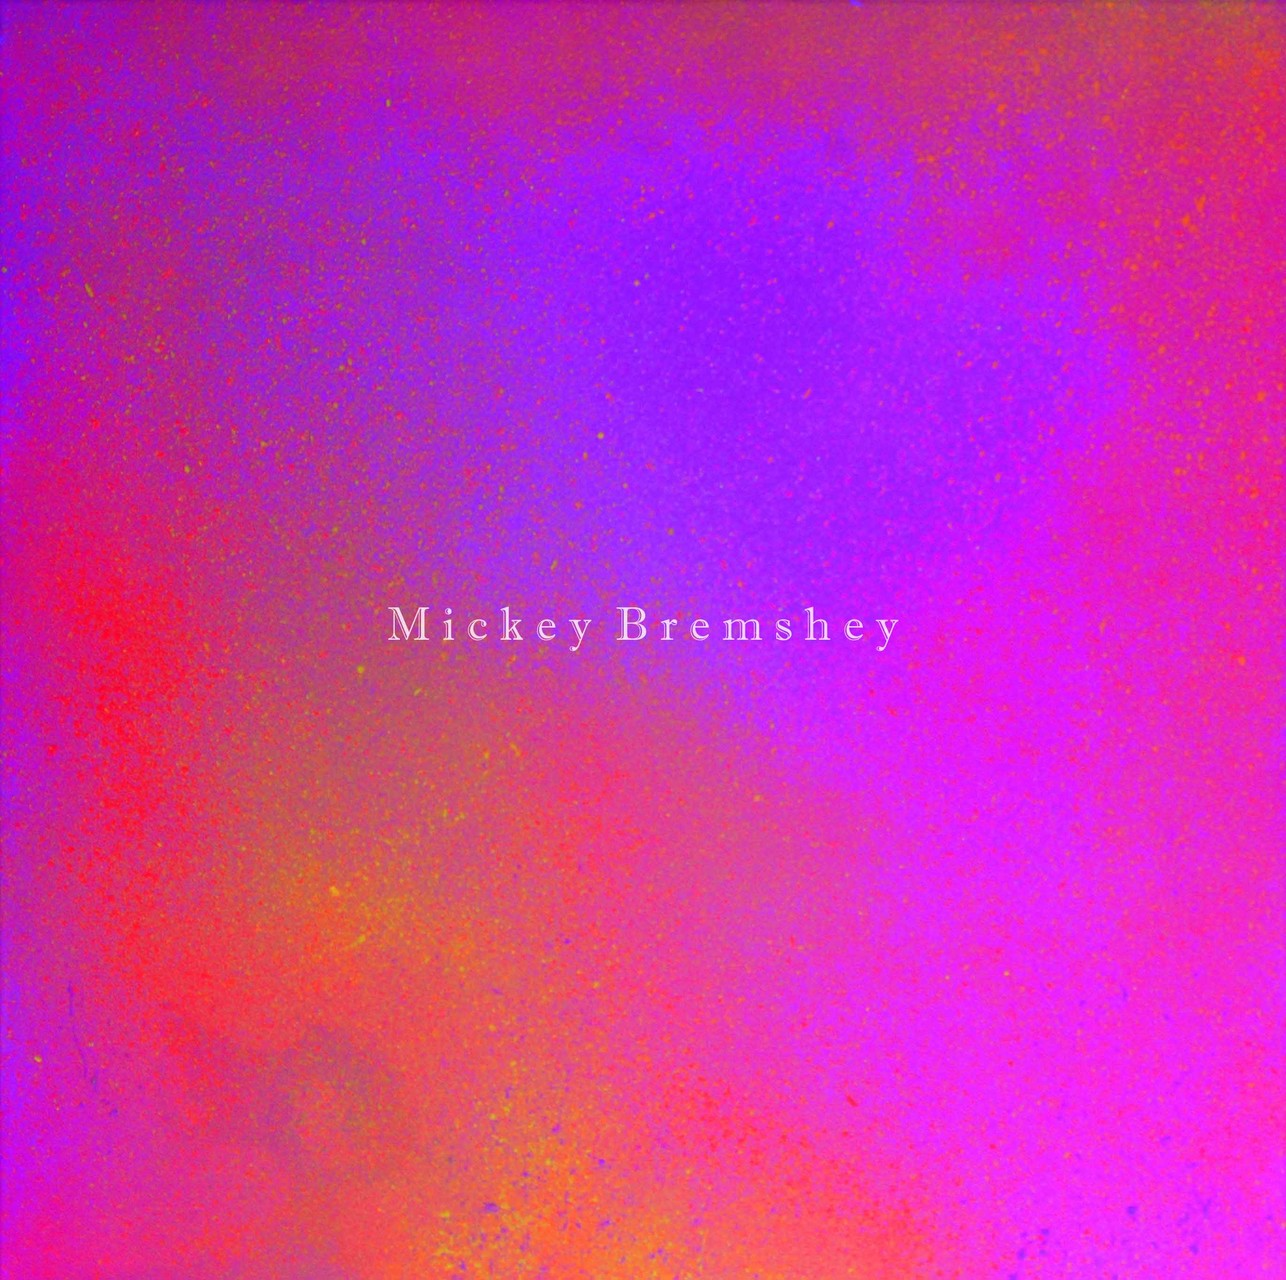 bremshey.illuminare.081275-003